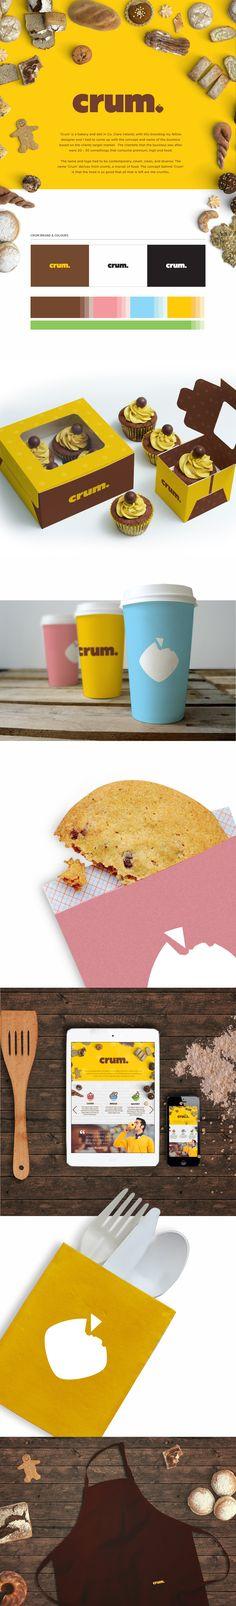 Crum Bakery and Delicatessen on Behance